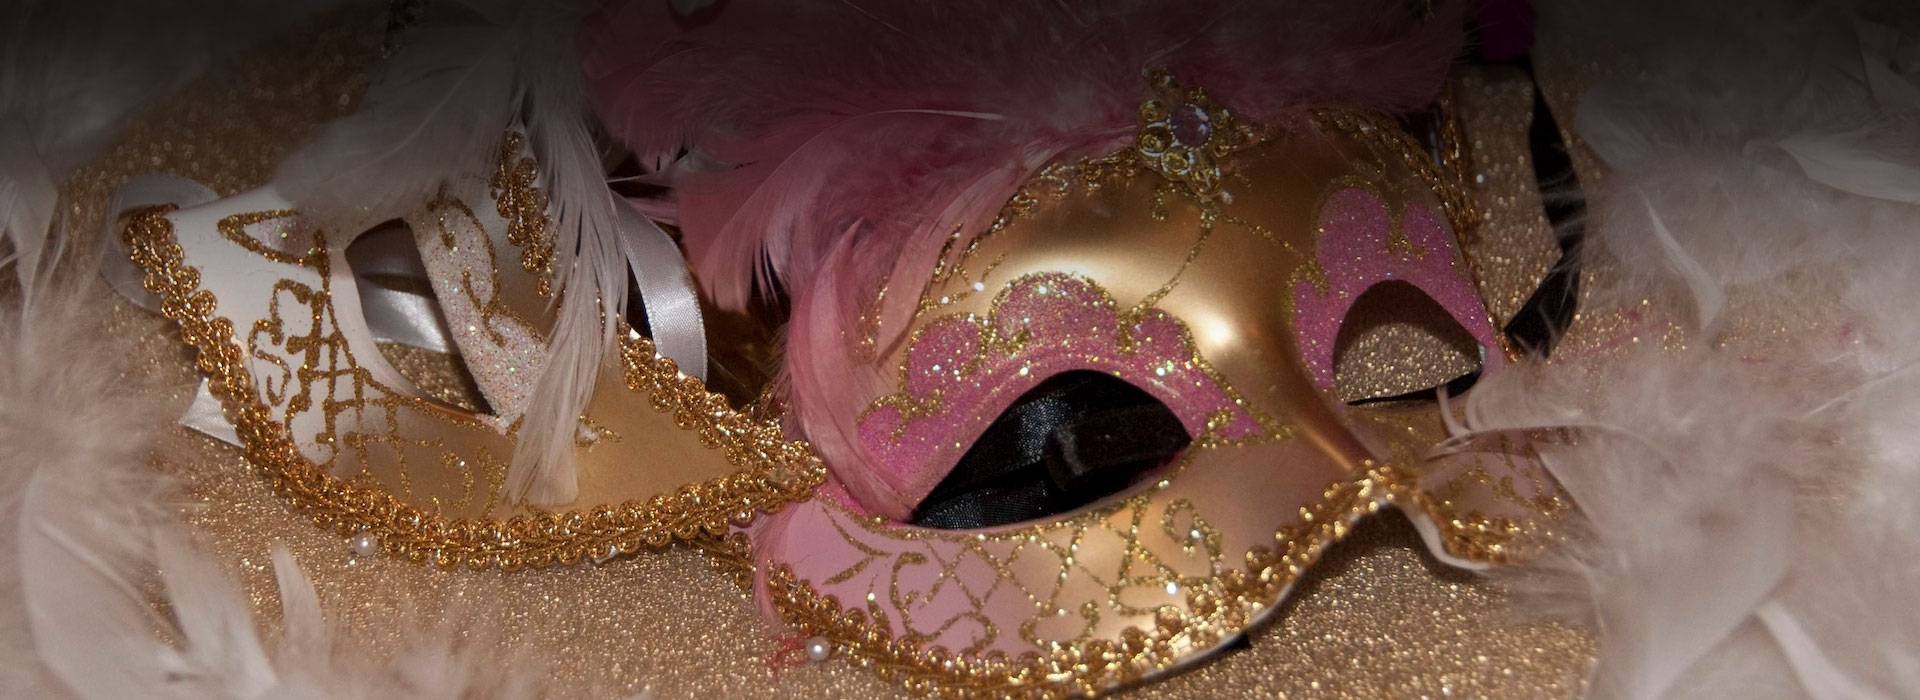 mask_new5